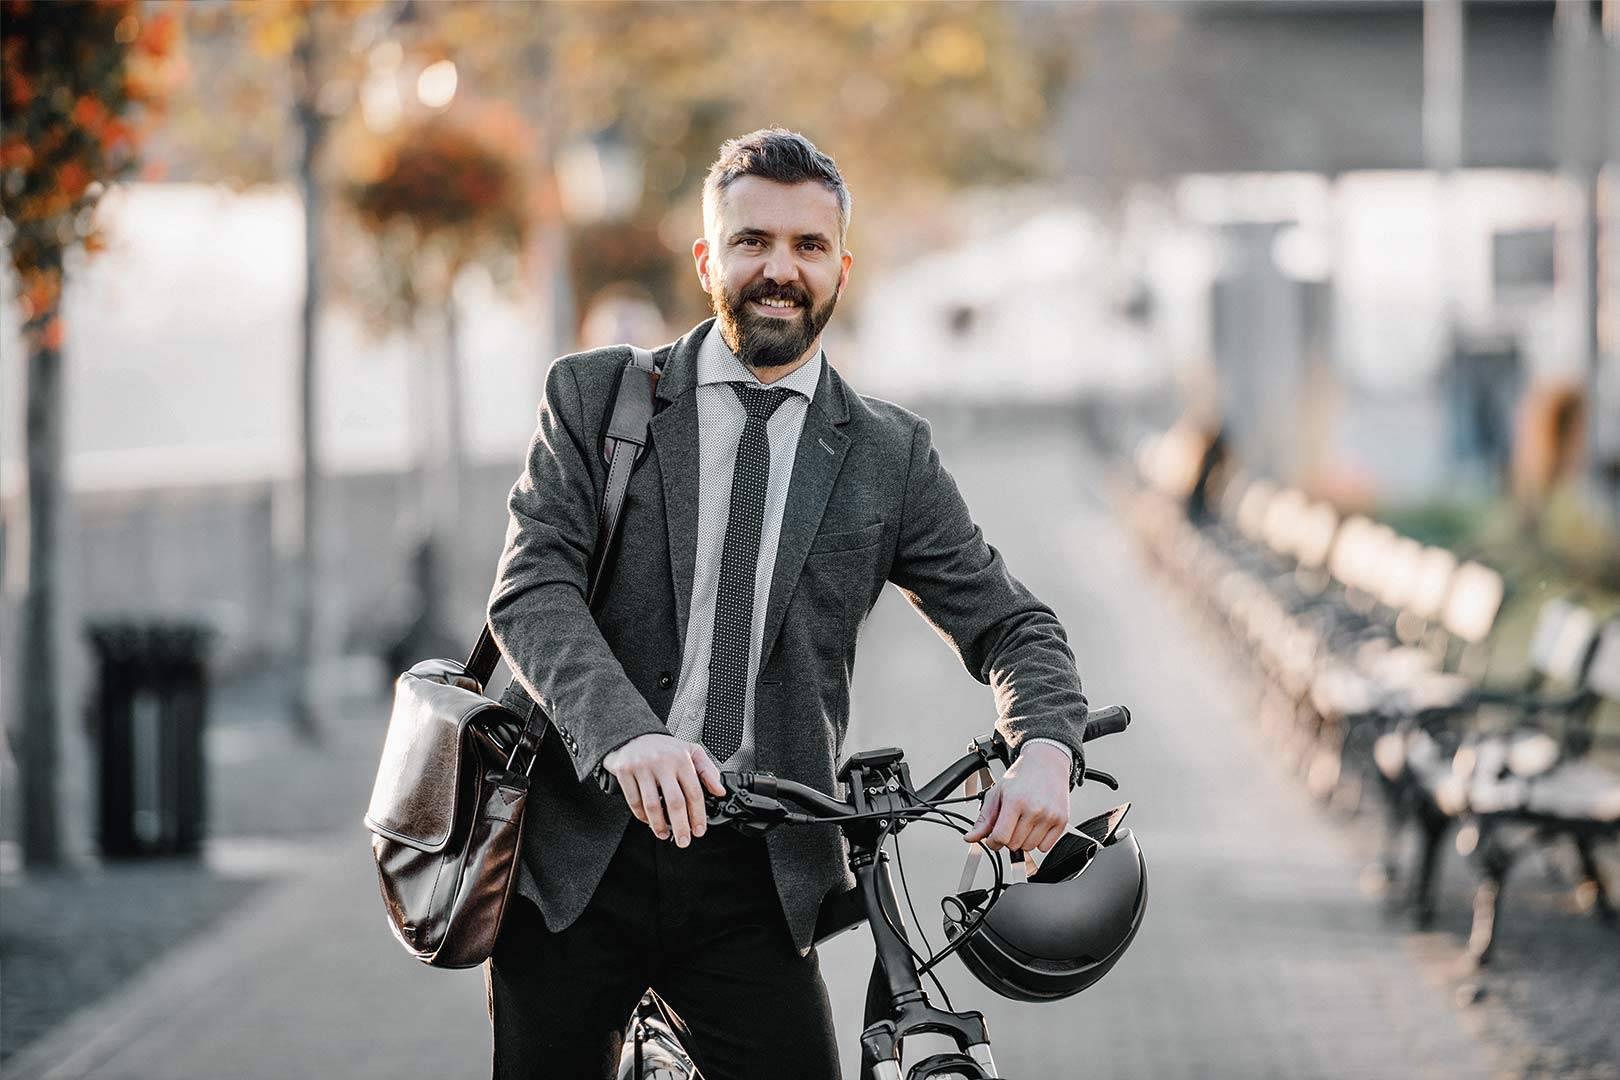 Man with job-bike